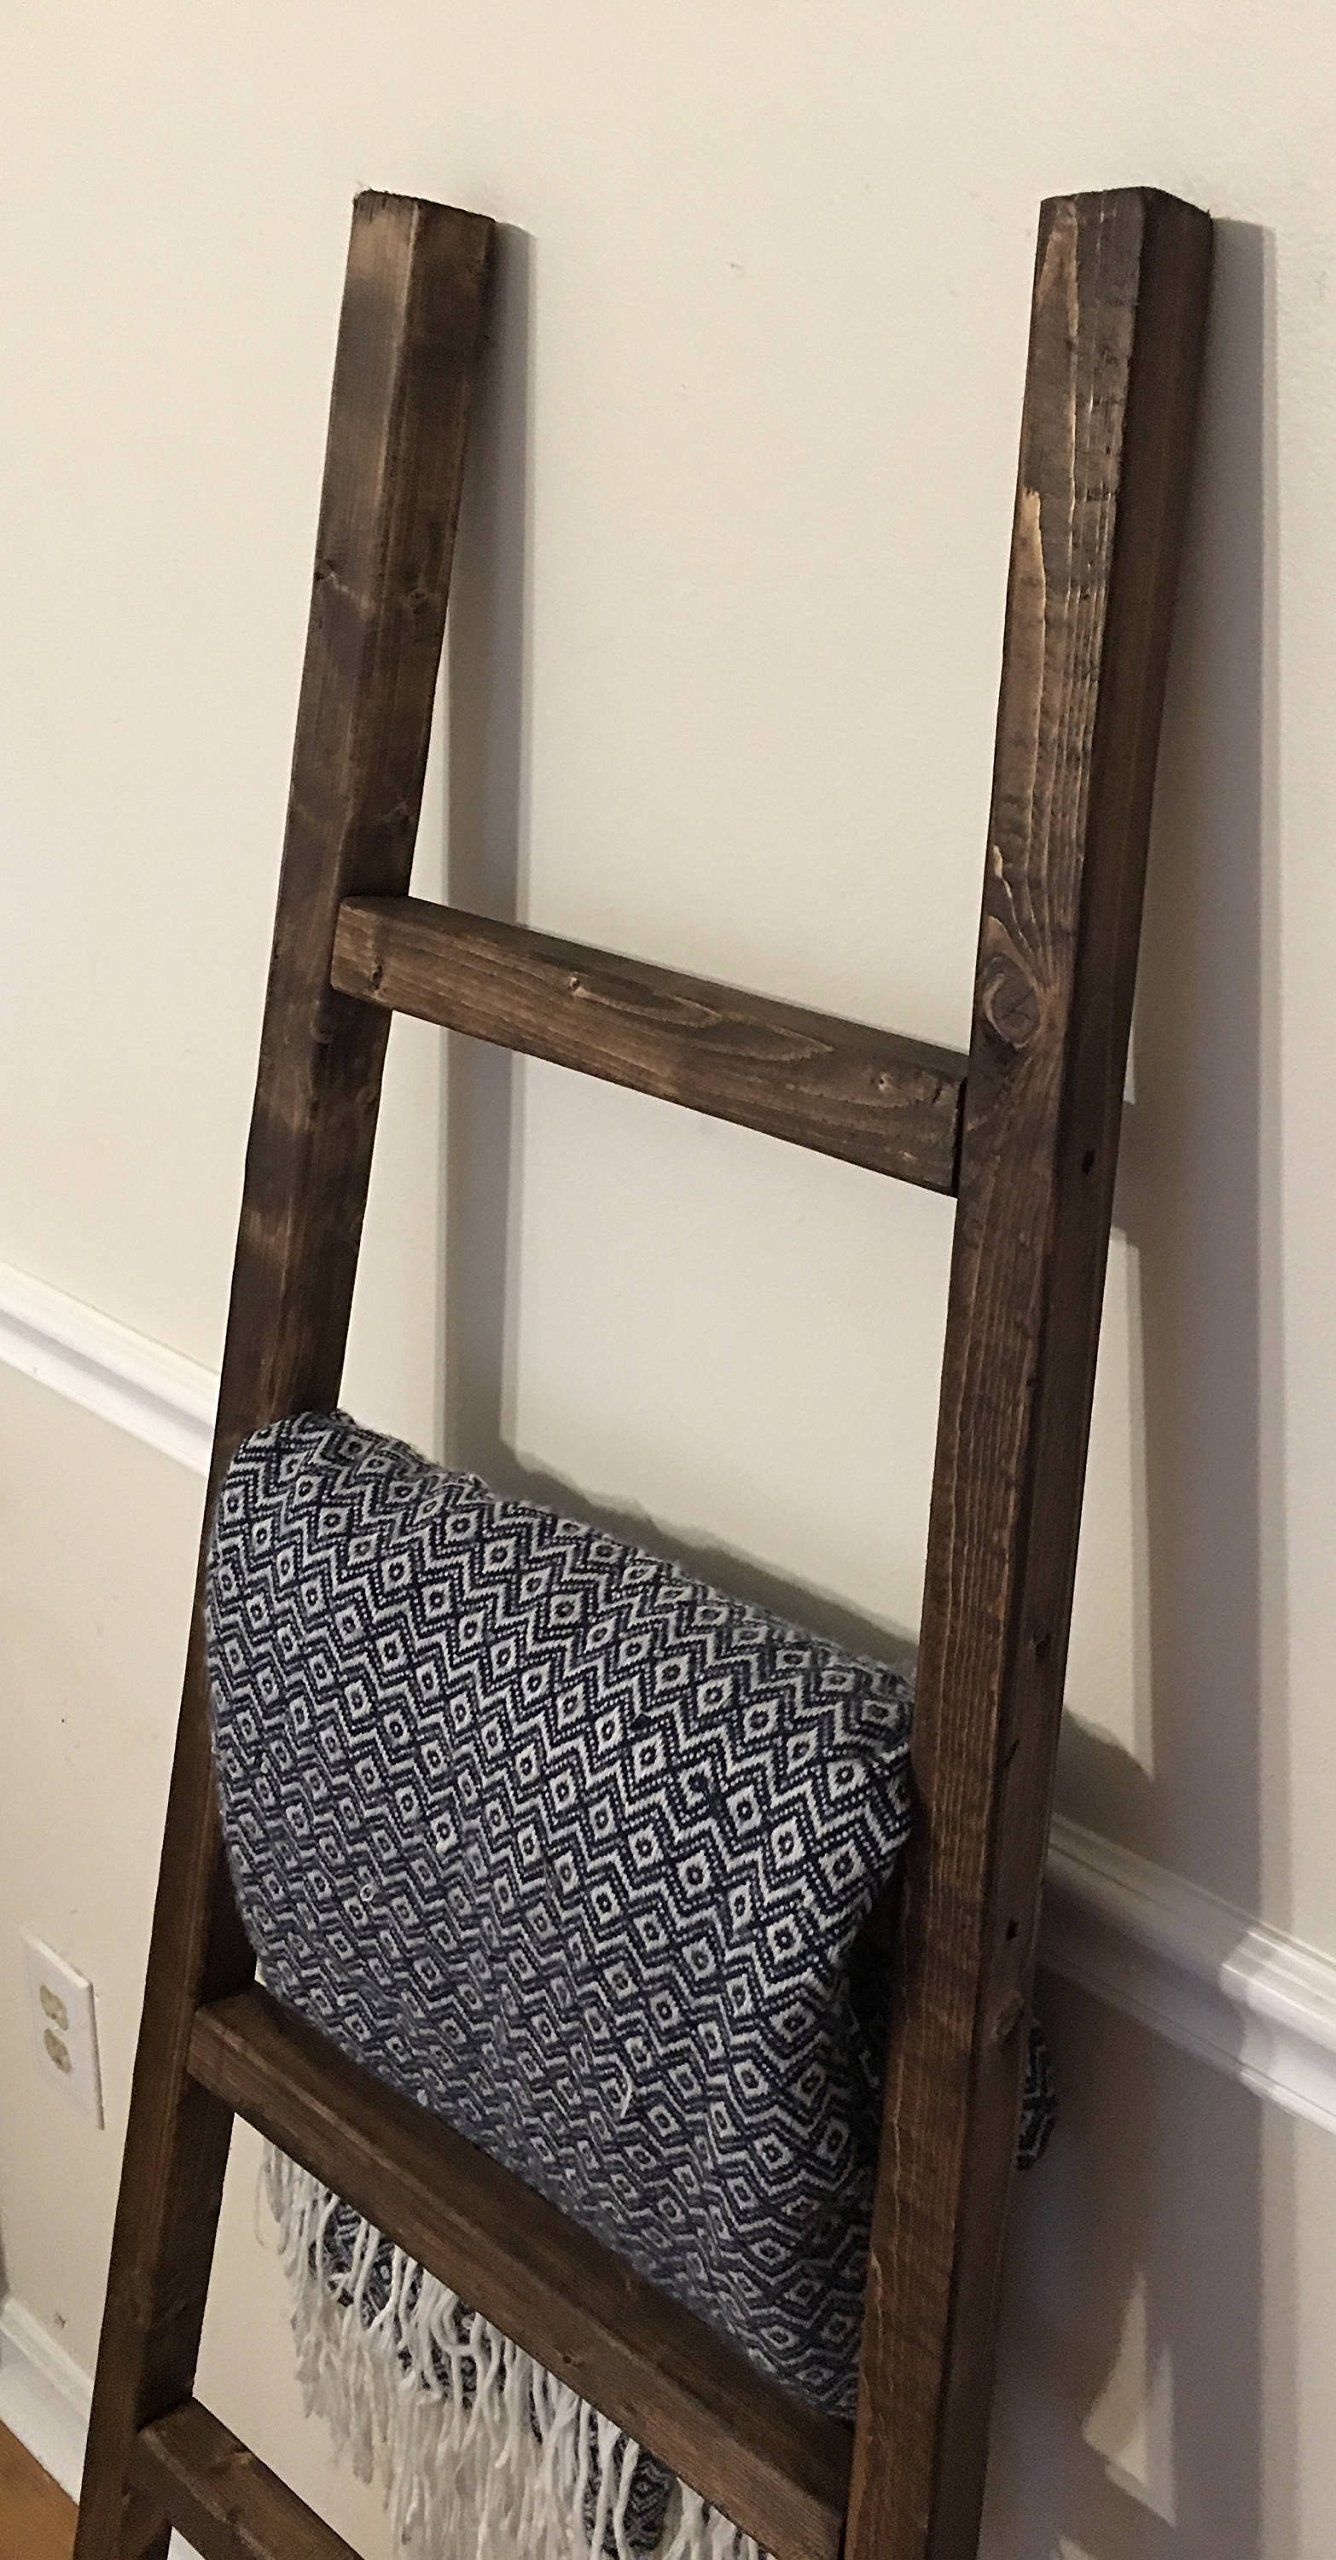 Rustic Ladder 60 Blanket Ladder Quilt Rack Leaning Ladder Towel Rack Pot Rack Reclaimed Wood Handmade Wood Blanket Ladder Blanket Ladder Quilt Rack